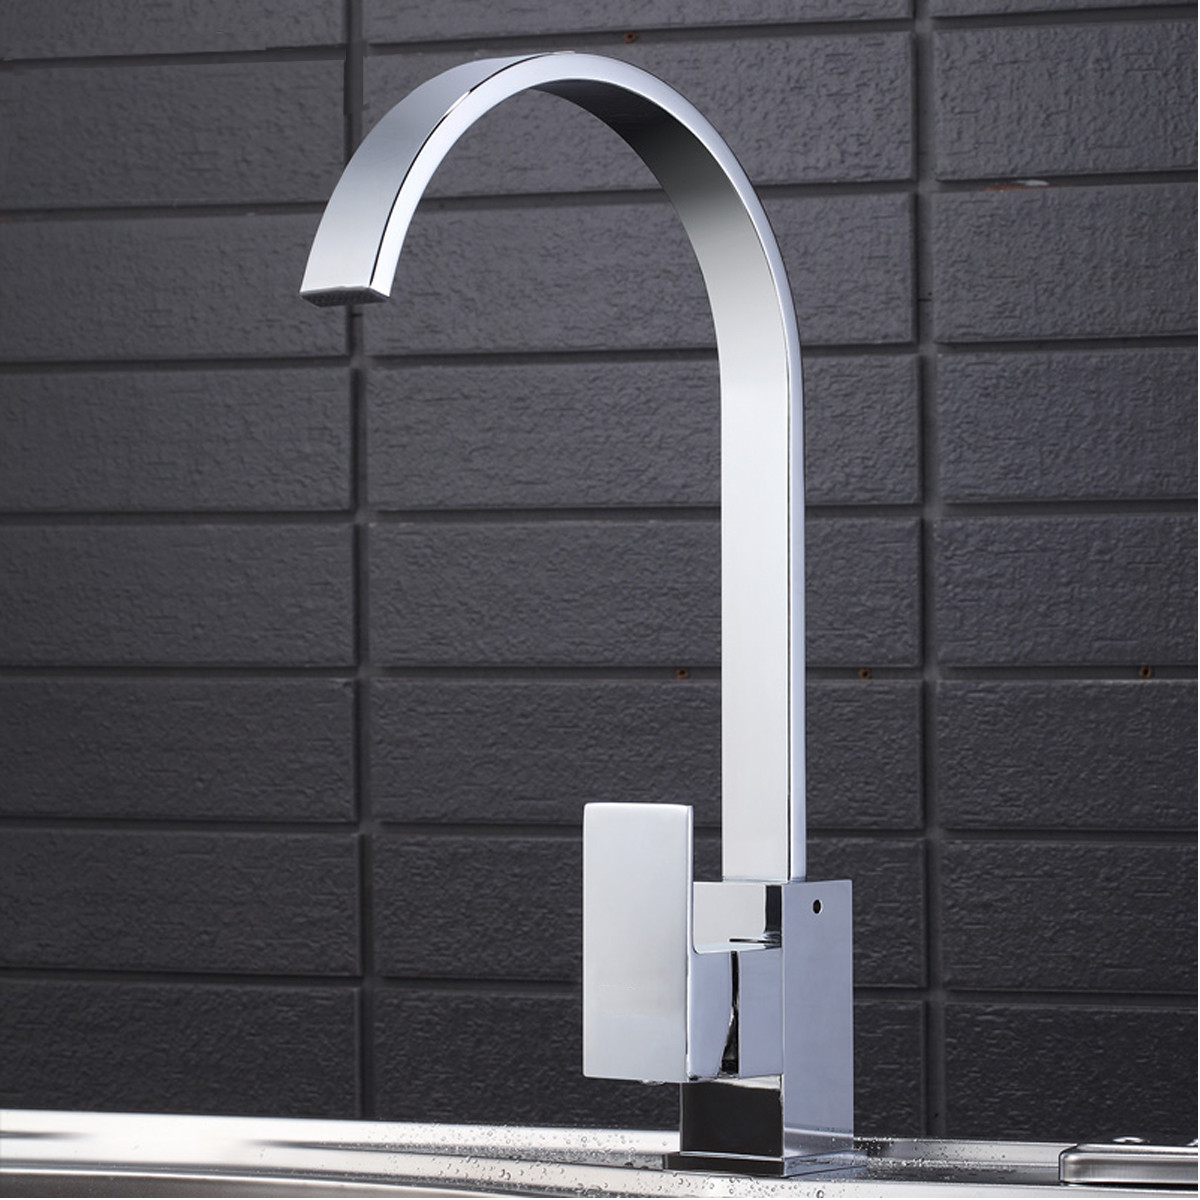 Kitchen Sink Faucet Mixer Tap Swi vel Spout Chrome Brass Square ...